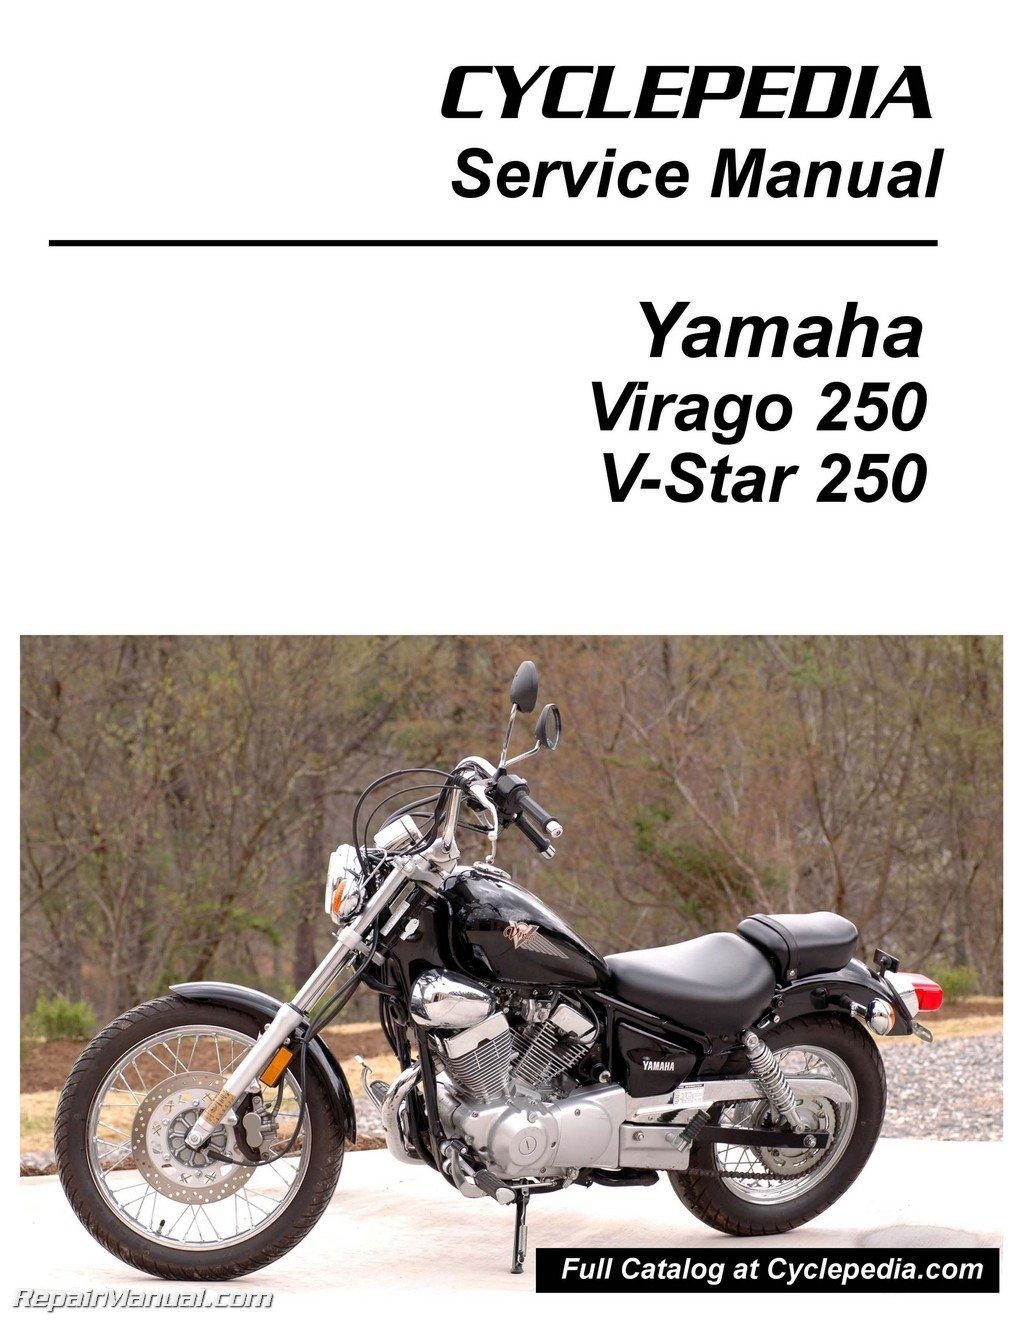 Yamaha Virago Wiring Diagram Merzienet Yamaha Dt 250 Wiring Diagram